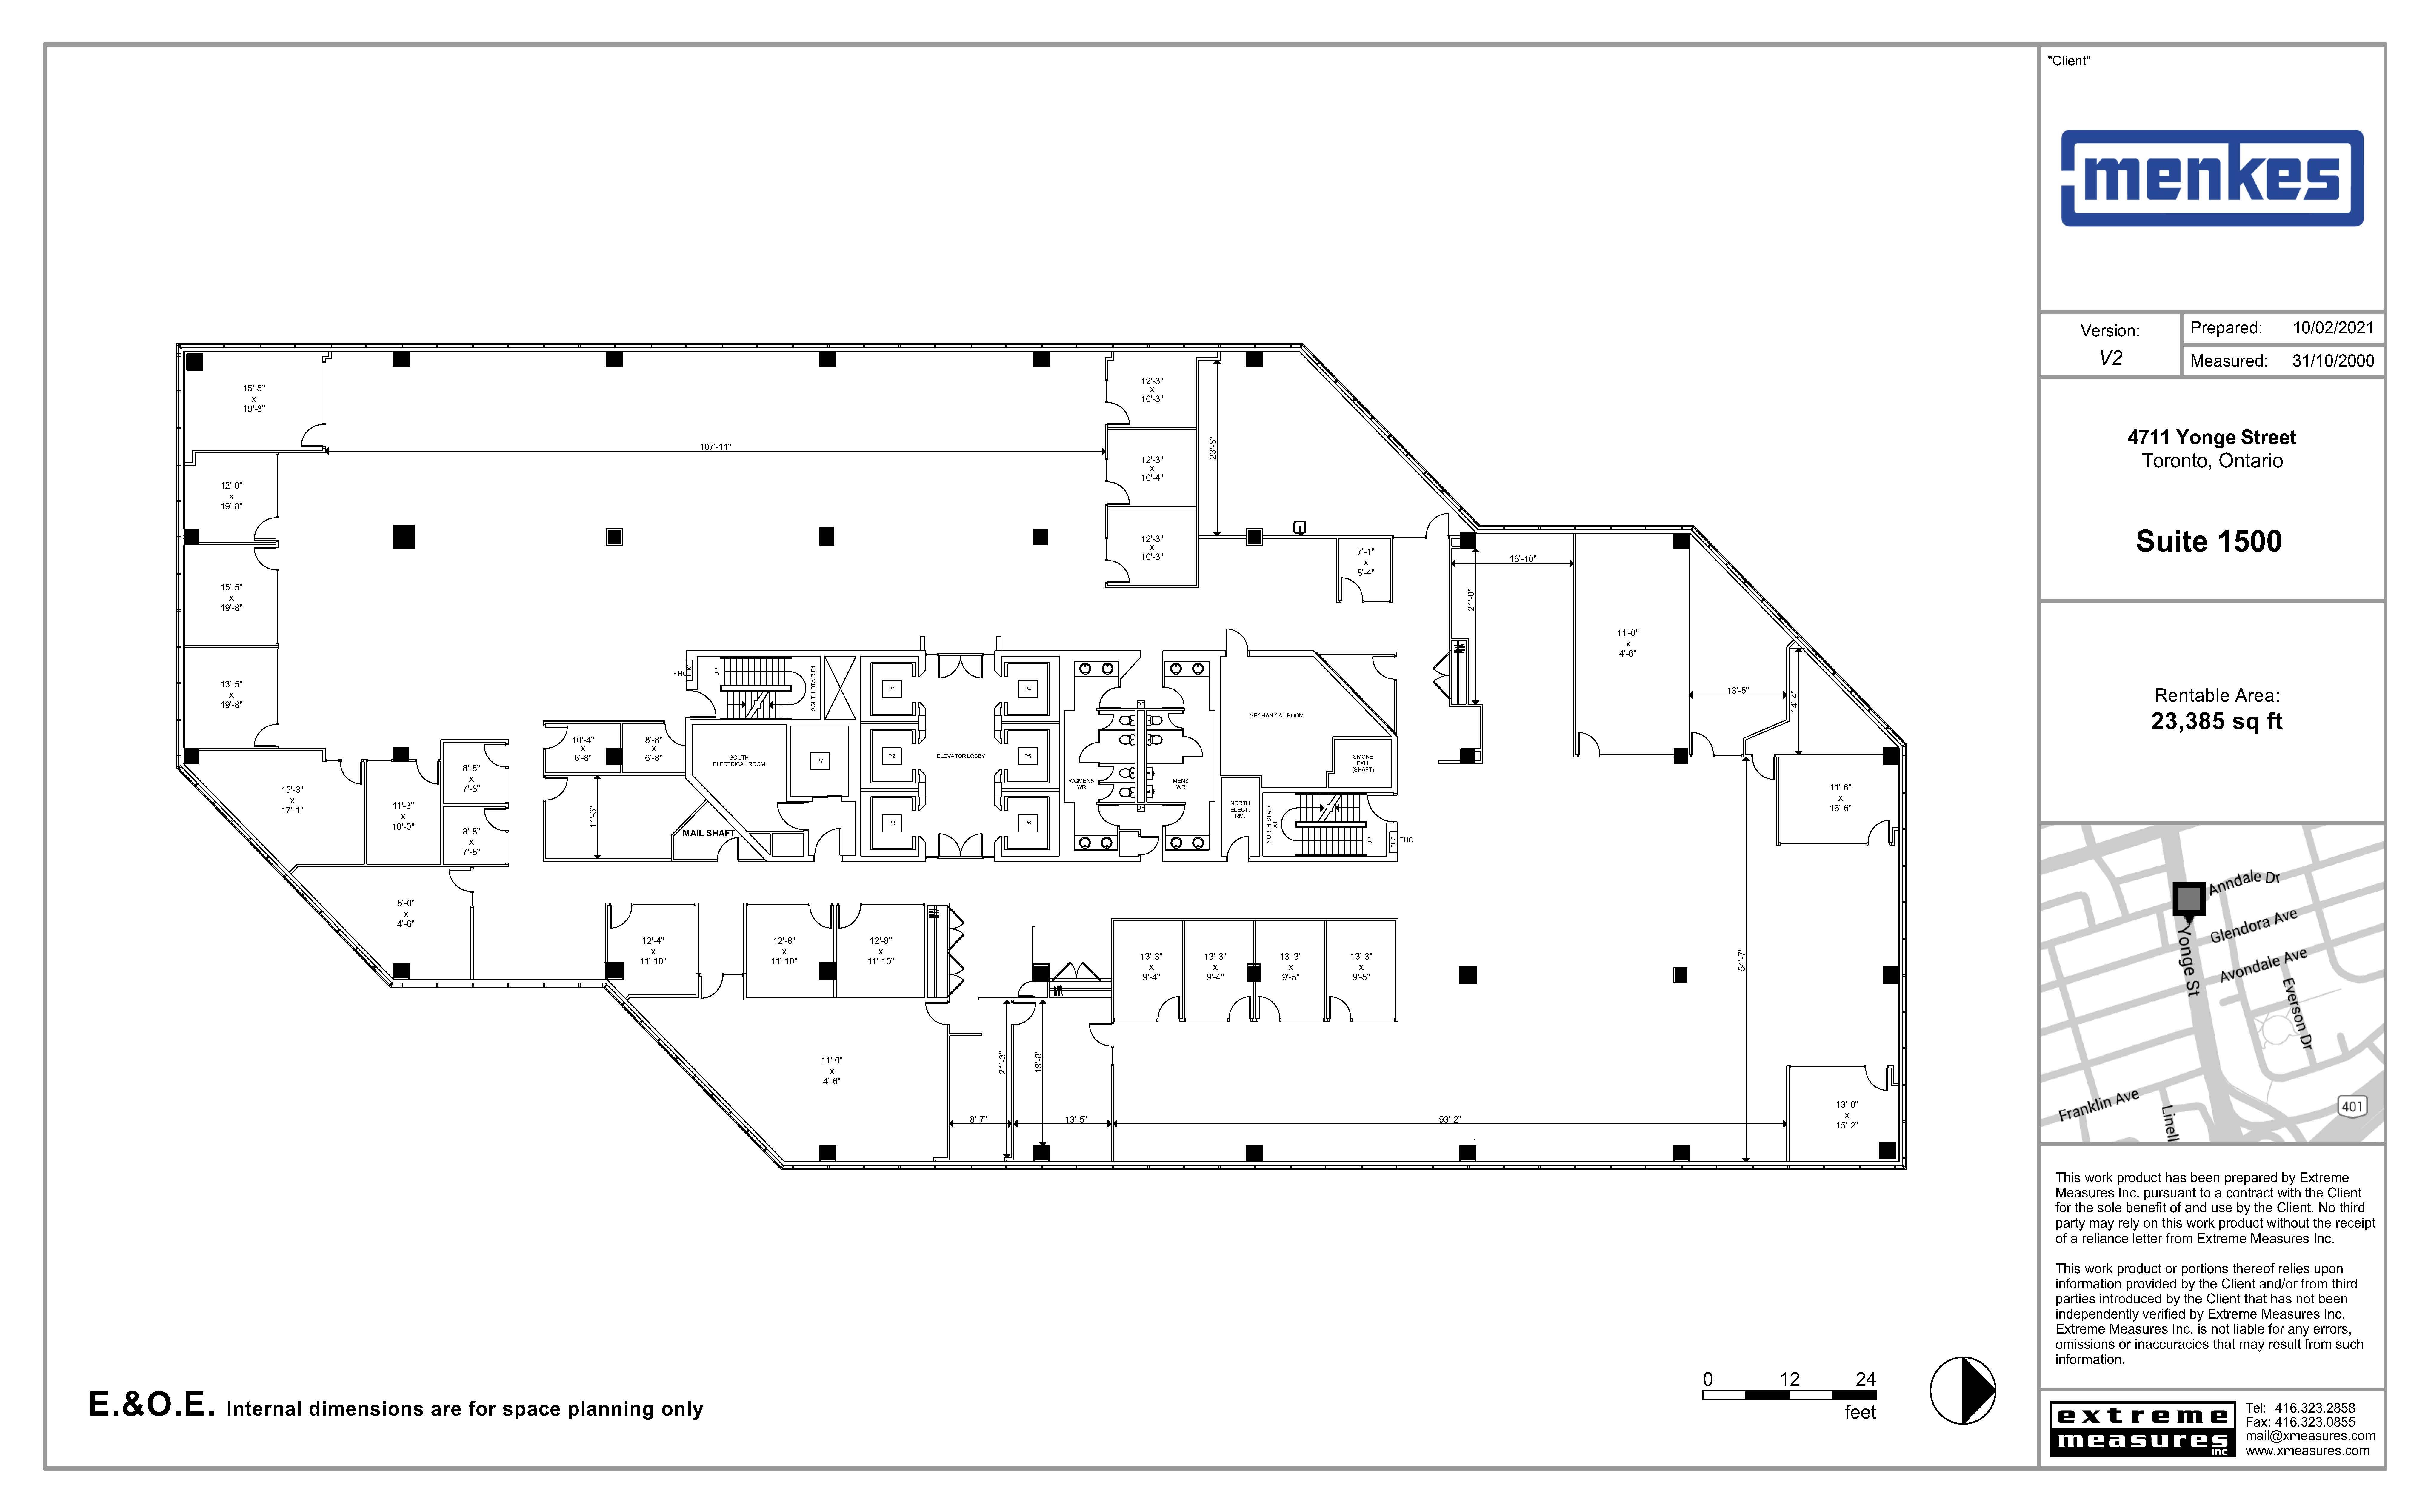 Floorplan thumbnail of Suite 1500